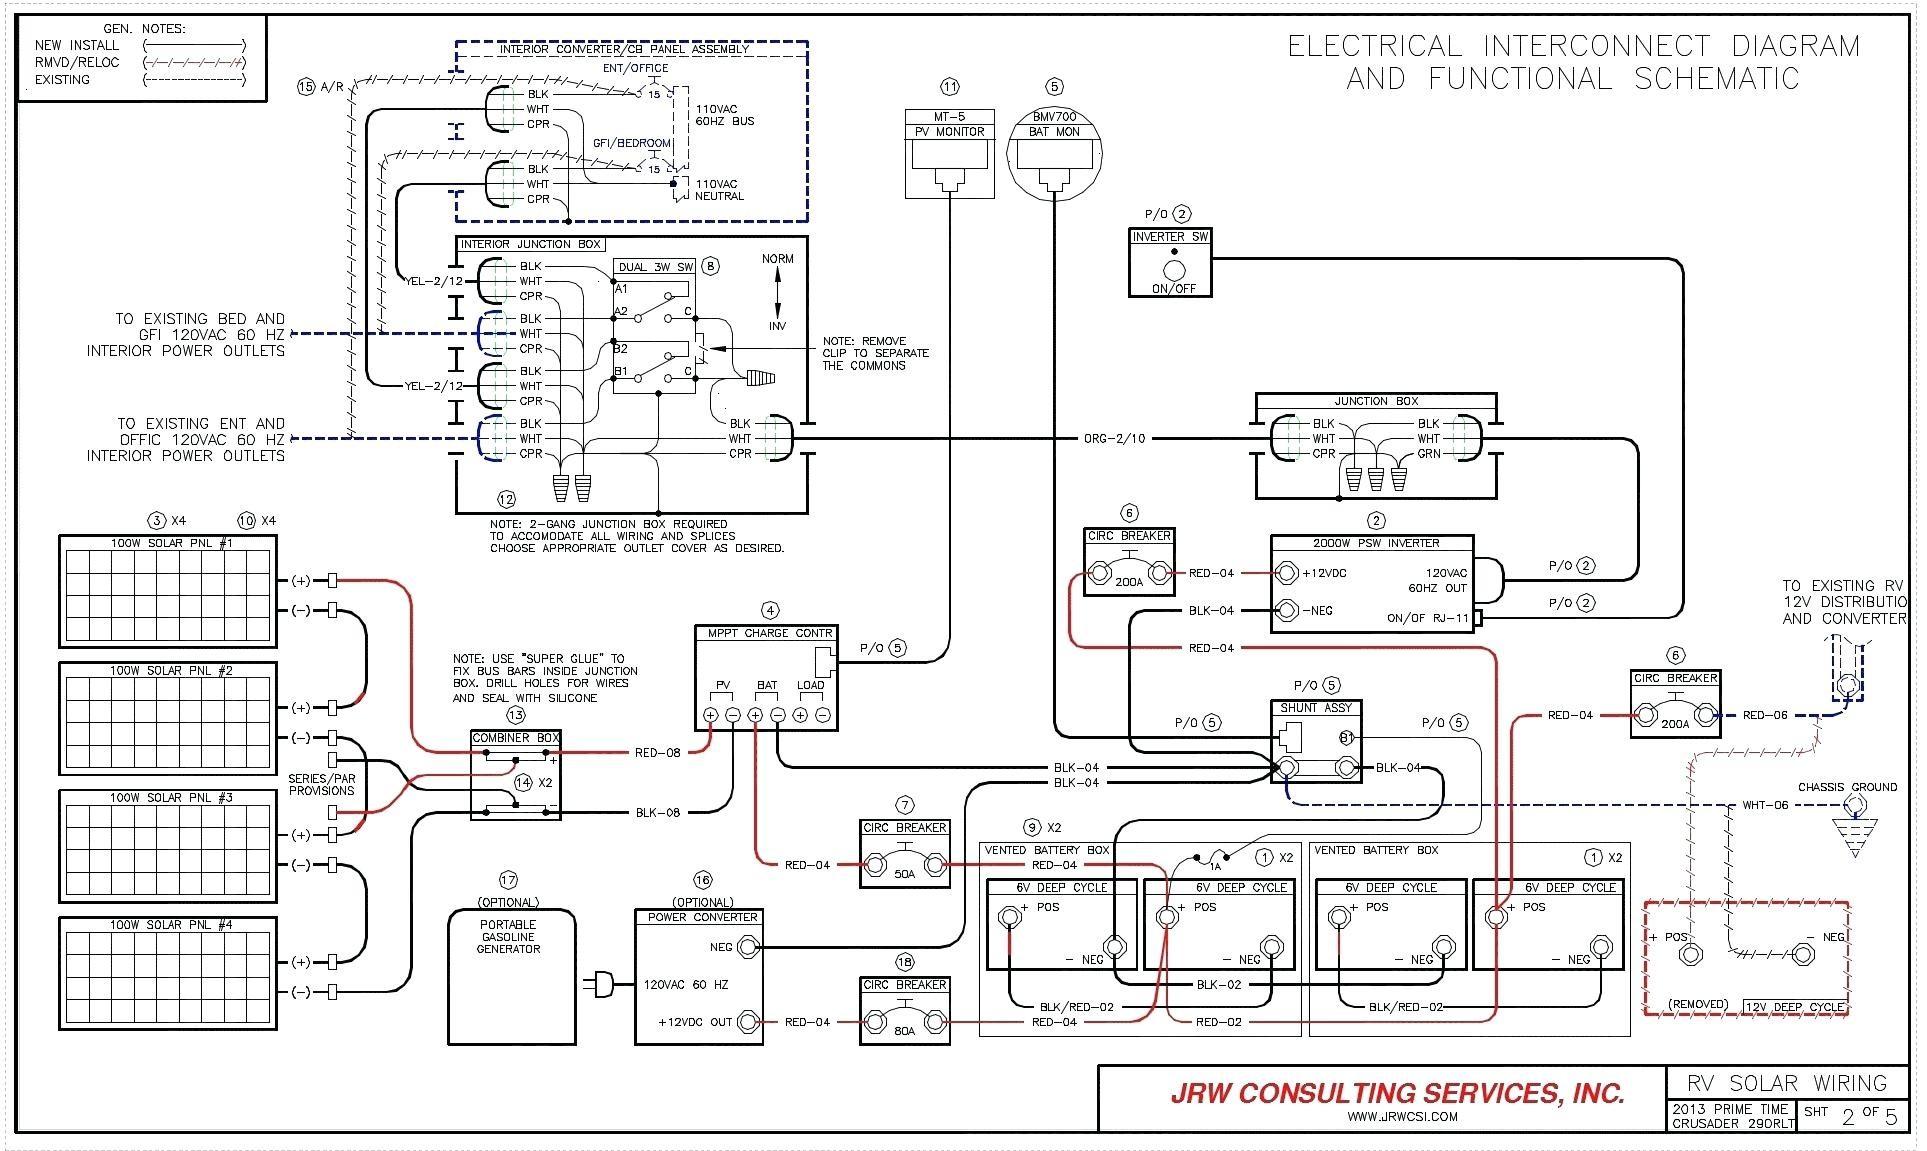 DIAGRAM] 2001 Monte Carlo Ls Wiring Diagram FULL Version HD Quality Wiring  Diagram - CARRYBOYPHIL.K-DANSE.FRK-danse.fr